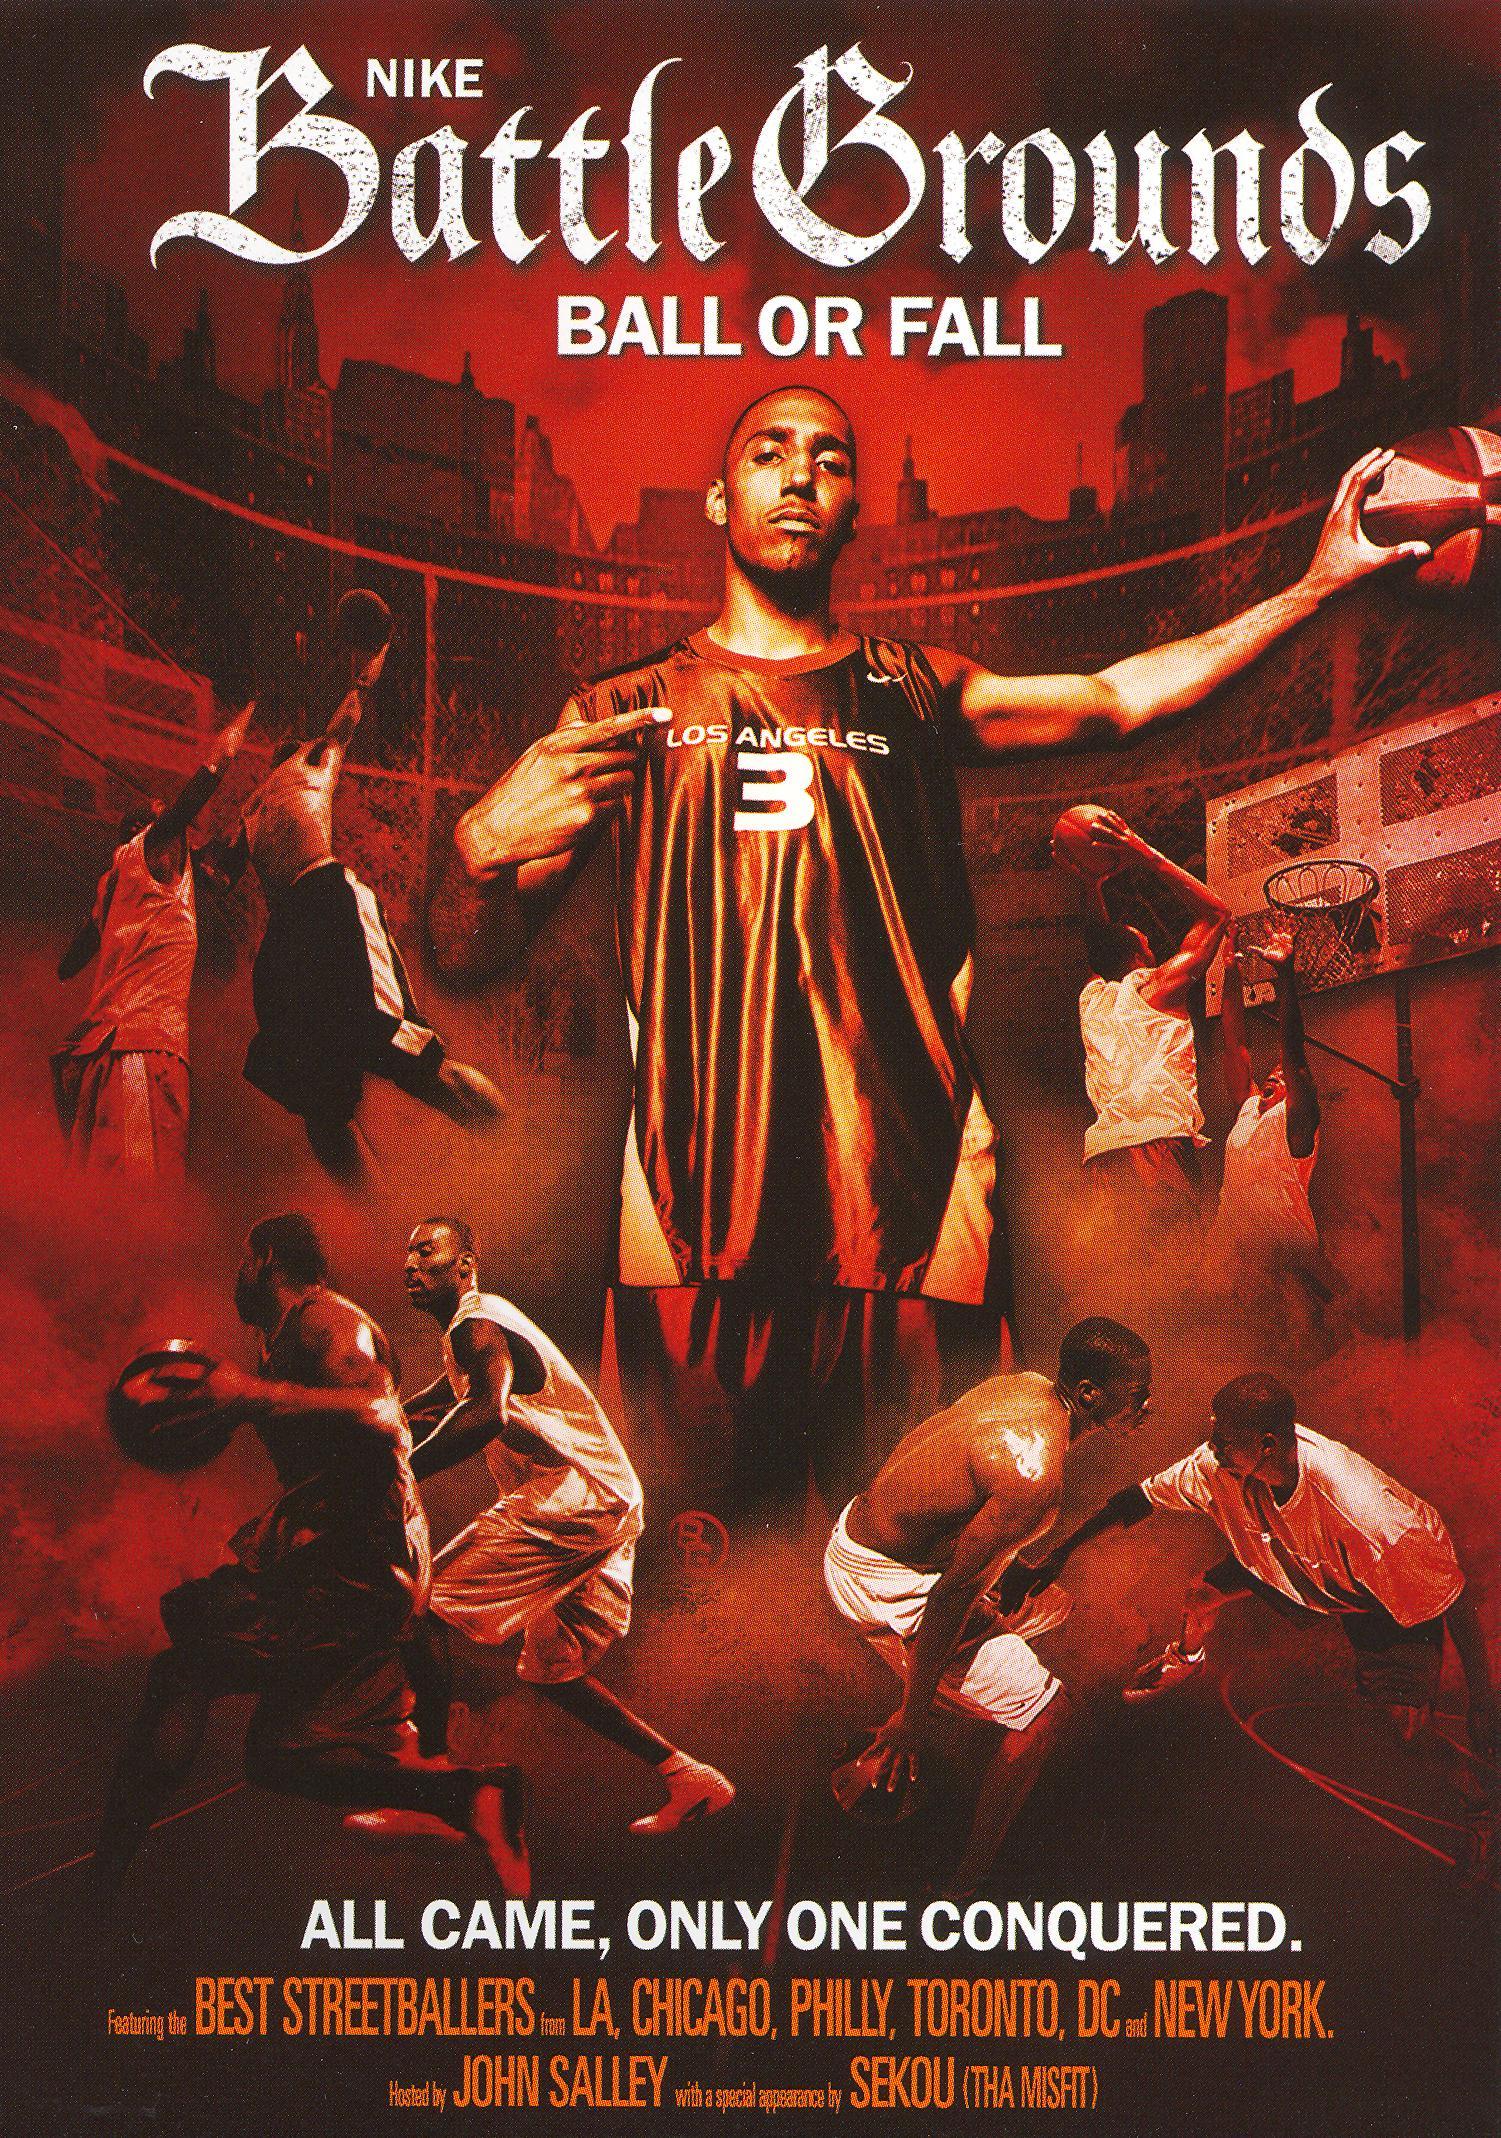 Nike Battlegrounds: Ball or Fall